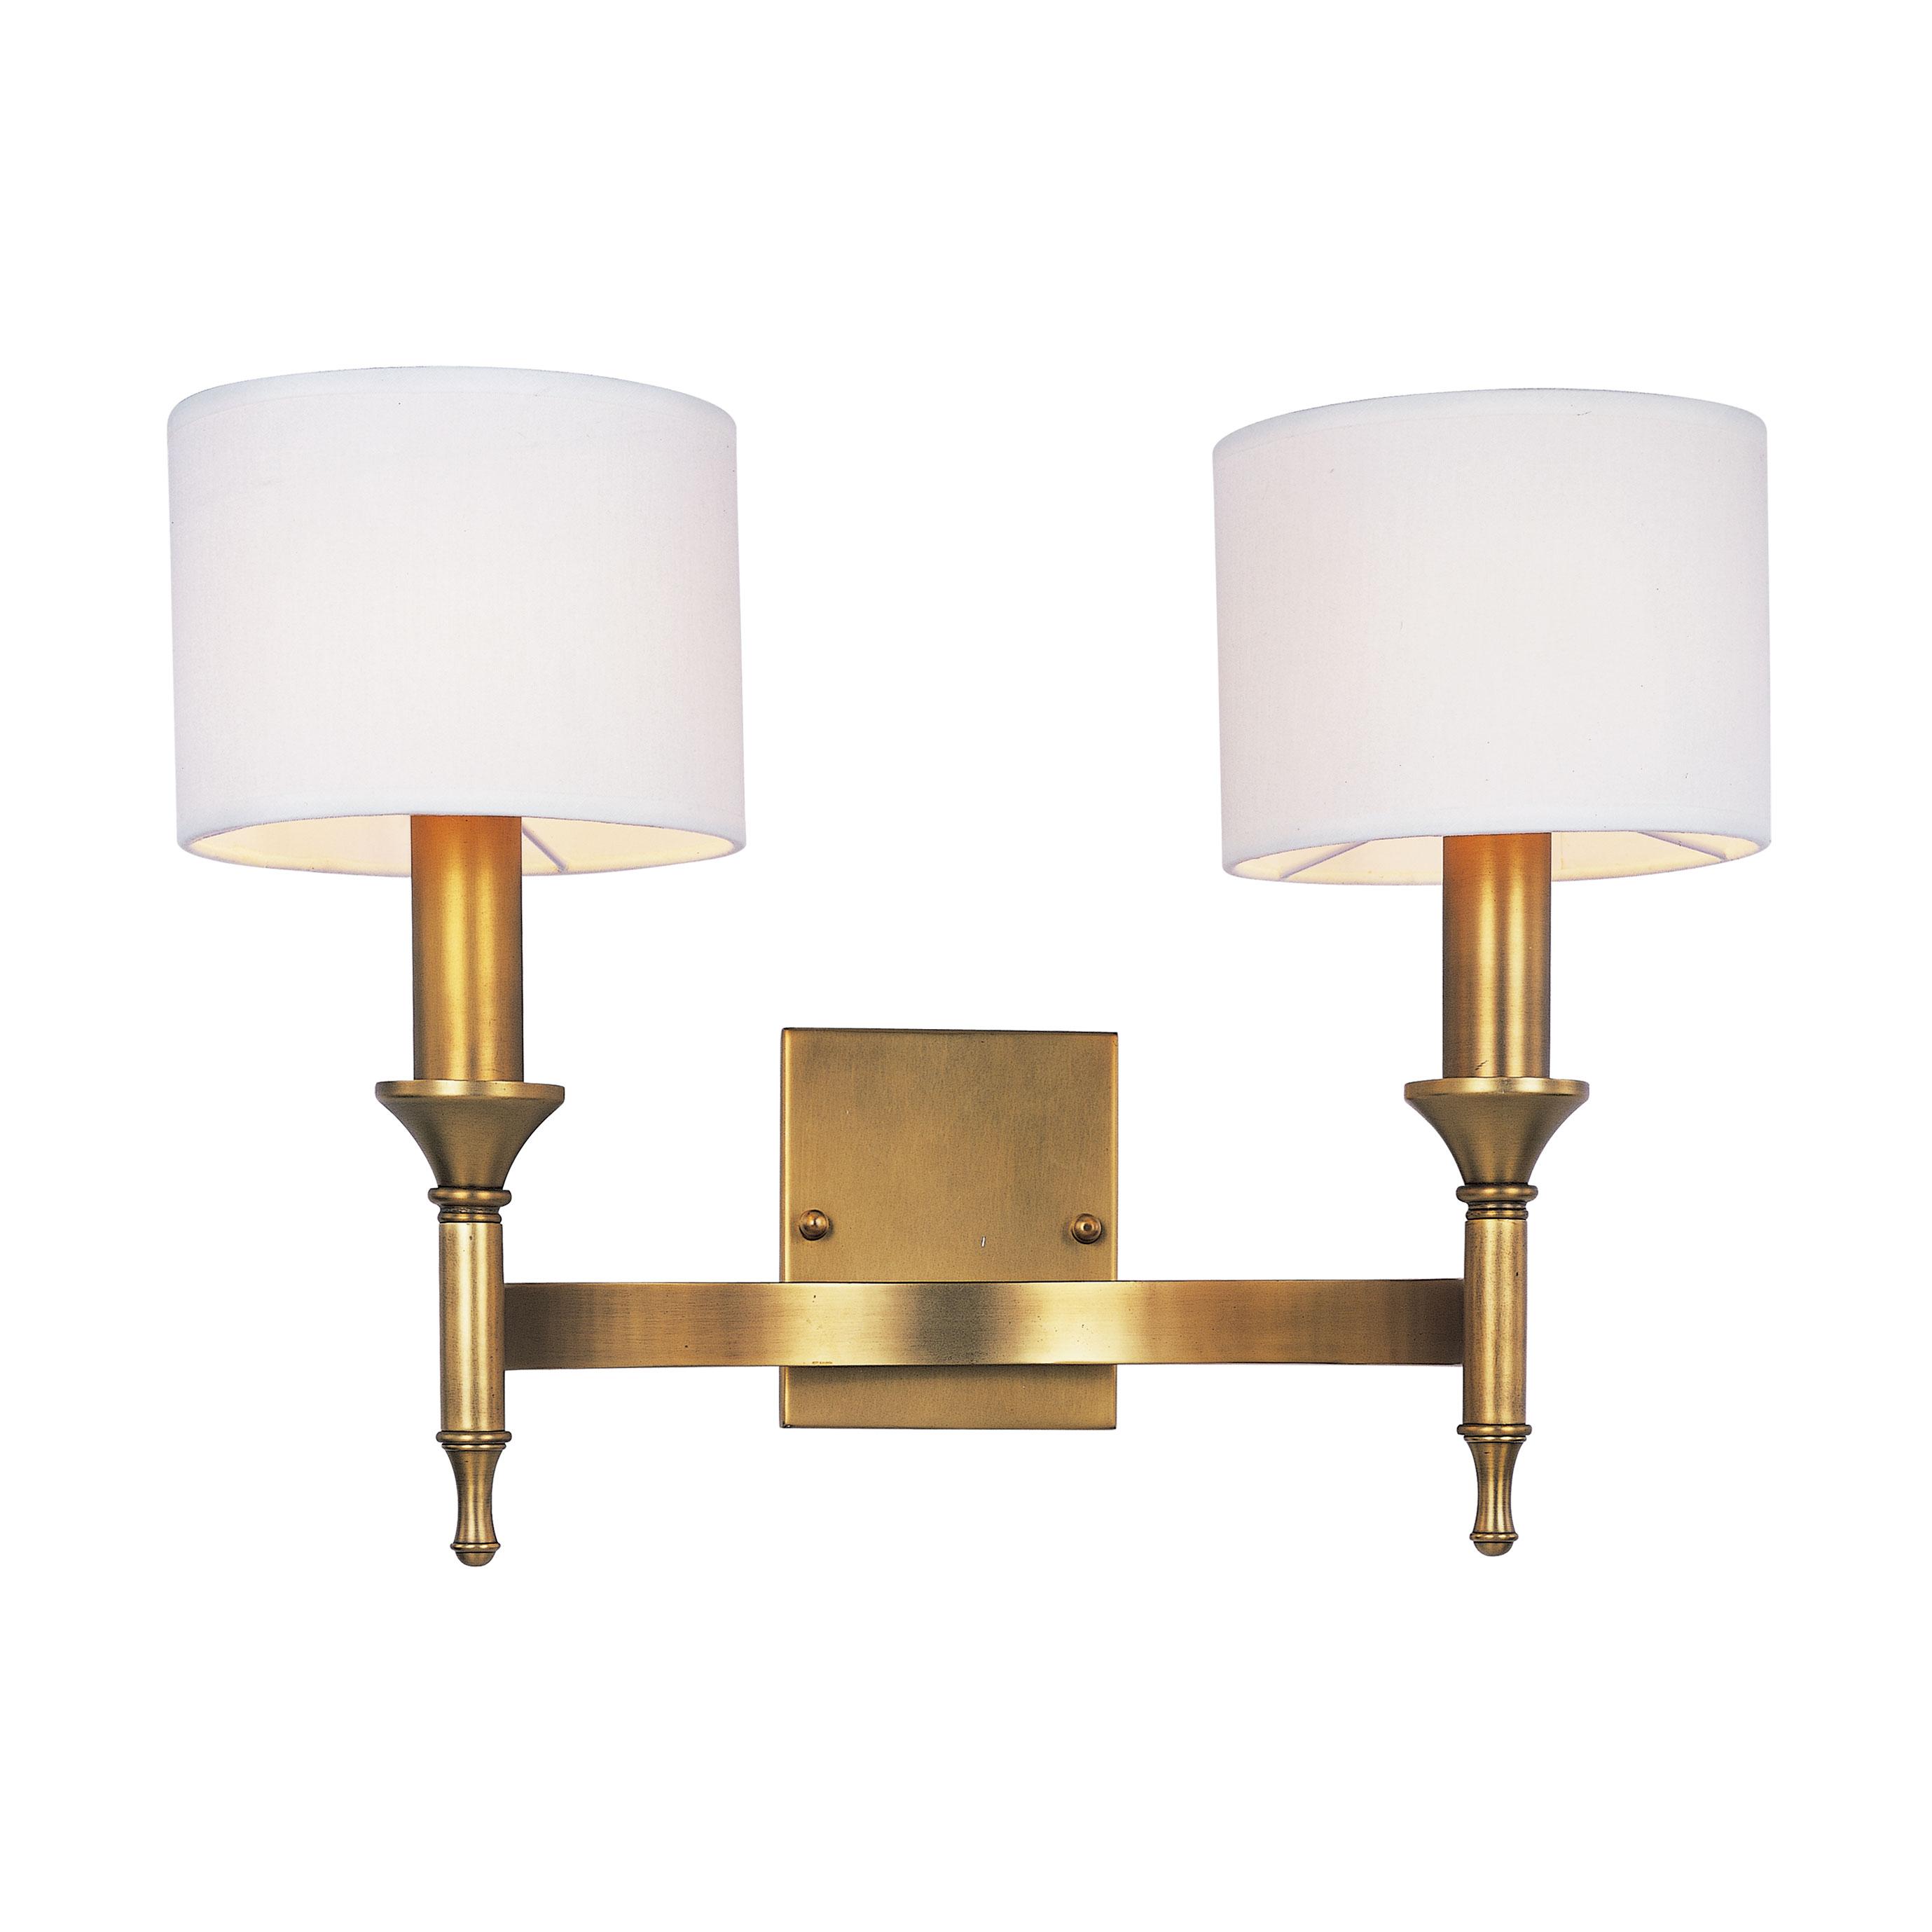 Fairmont Wall Sconce | Maxim Lighting